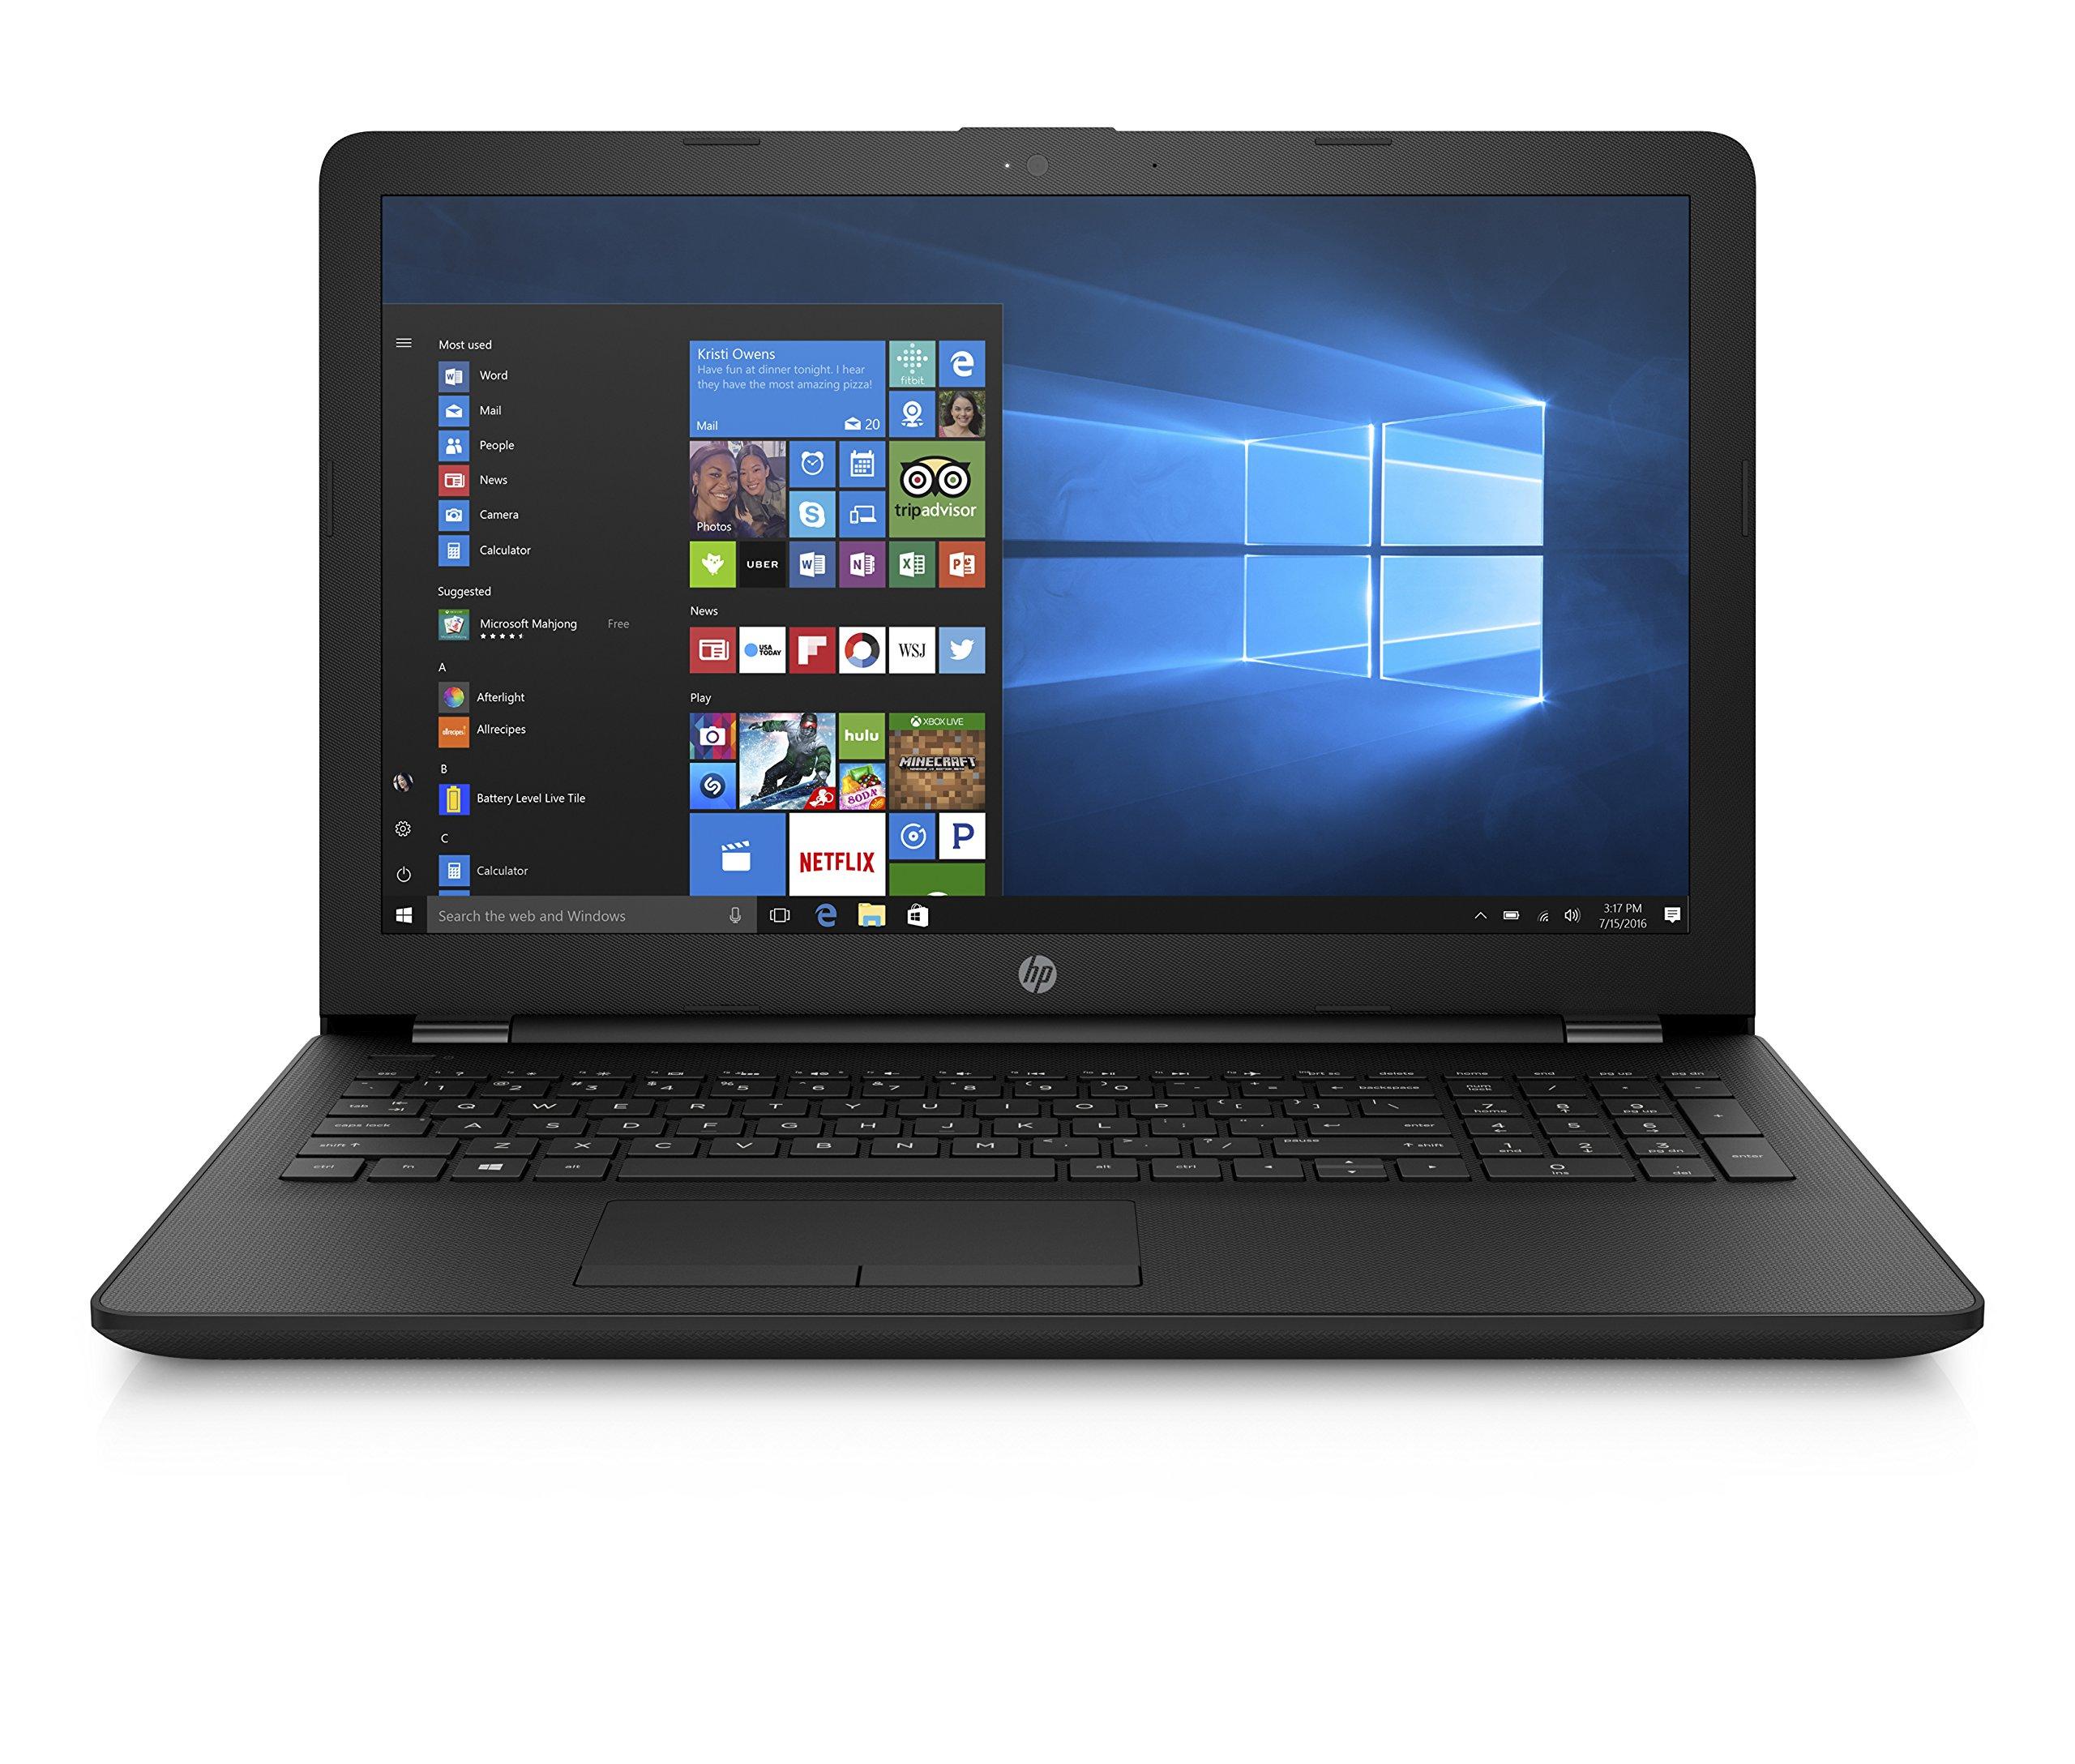 HP Notebook 15-bs040ns – Ordenador Portátil HD, Intel Core i3-6006U, 4 GB RAM, 500 GB HDD, Intel HD Graphcis 620, Windows 10, Negro, 15.6″ – Teclado QWERTY Español